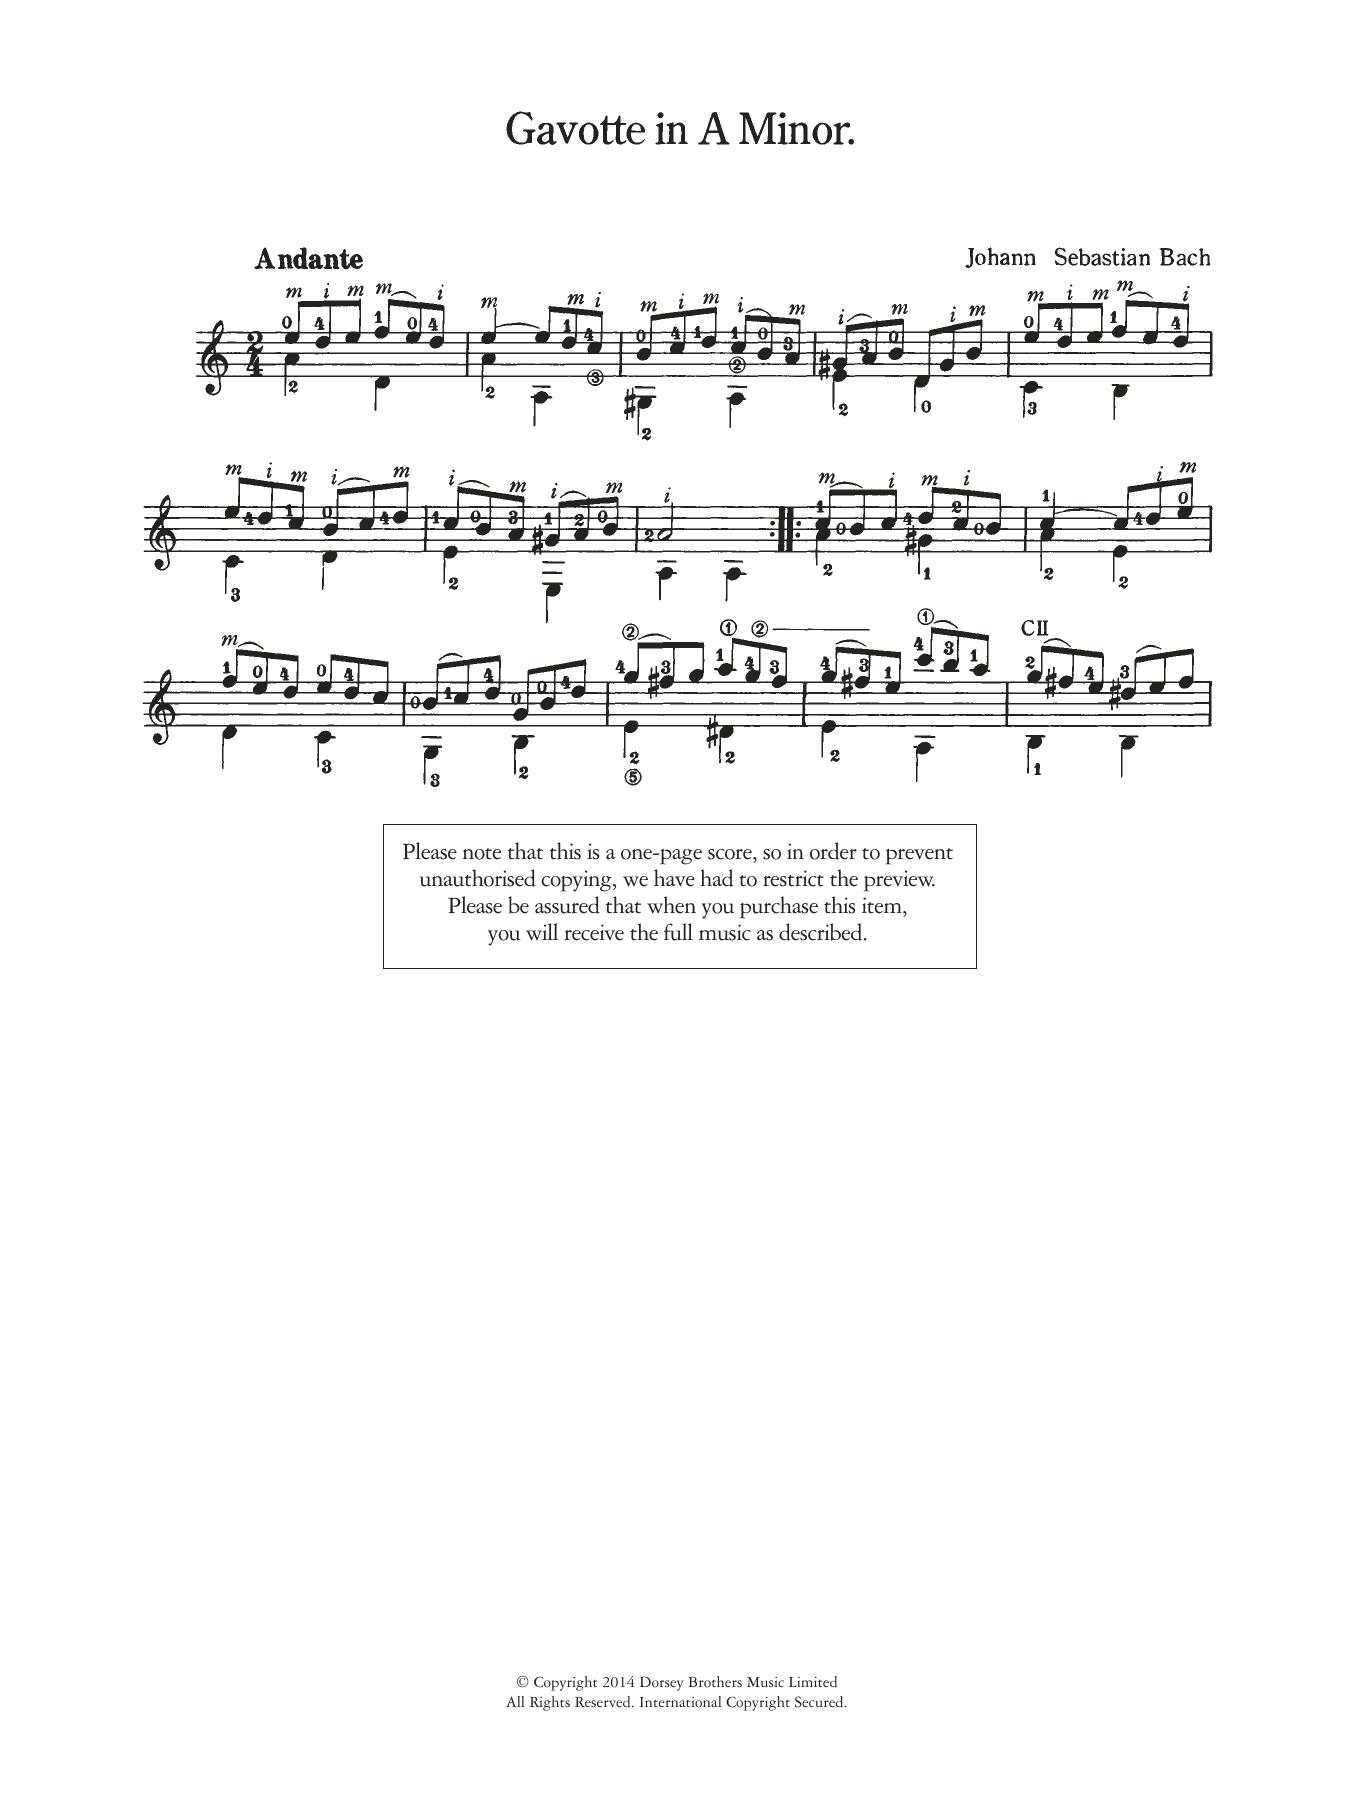 Gavotte in A Minor Sheet Music